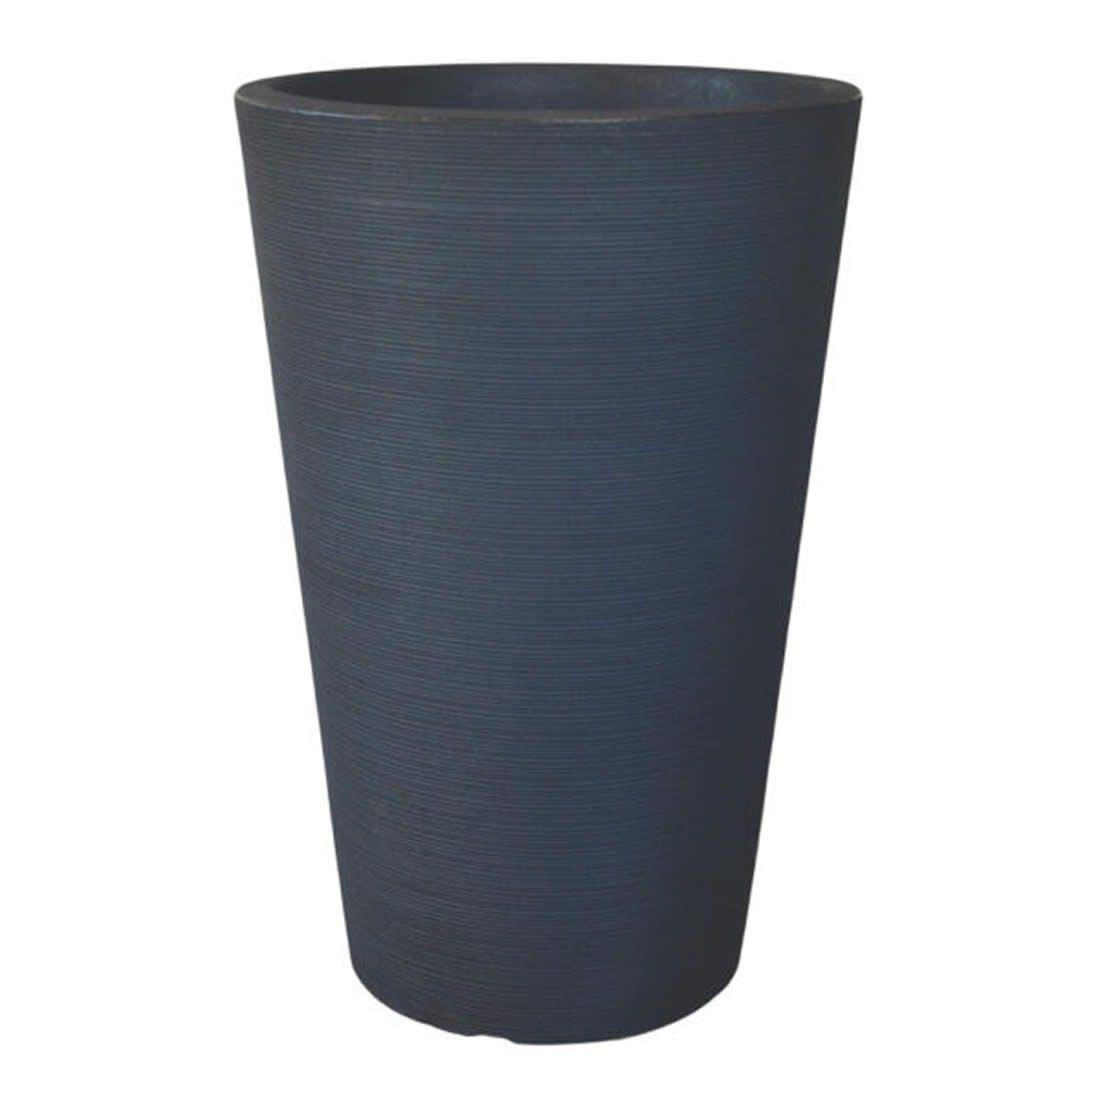 Vaso Para Planta Cônico Linea 50 Chumbo - Japi